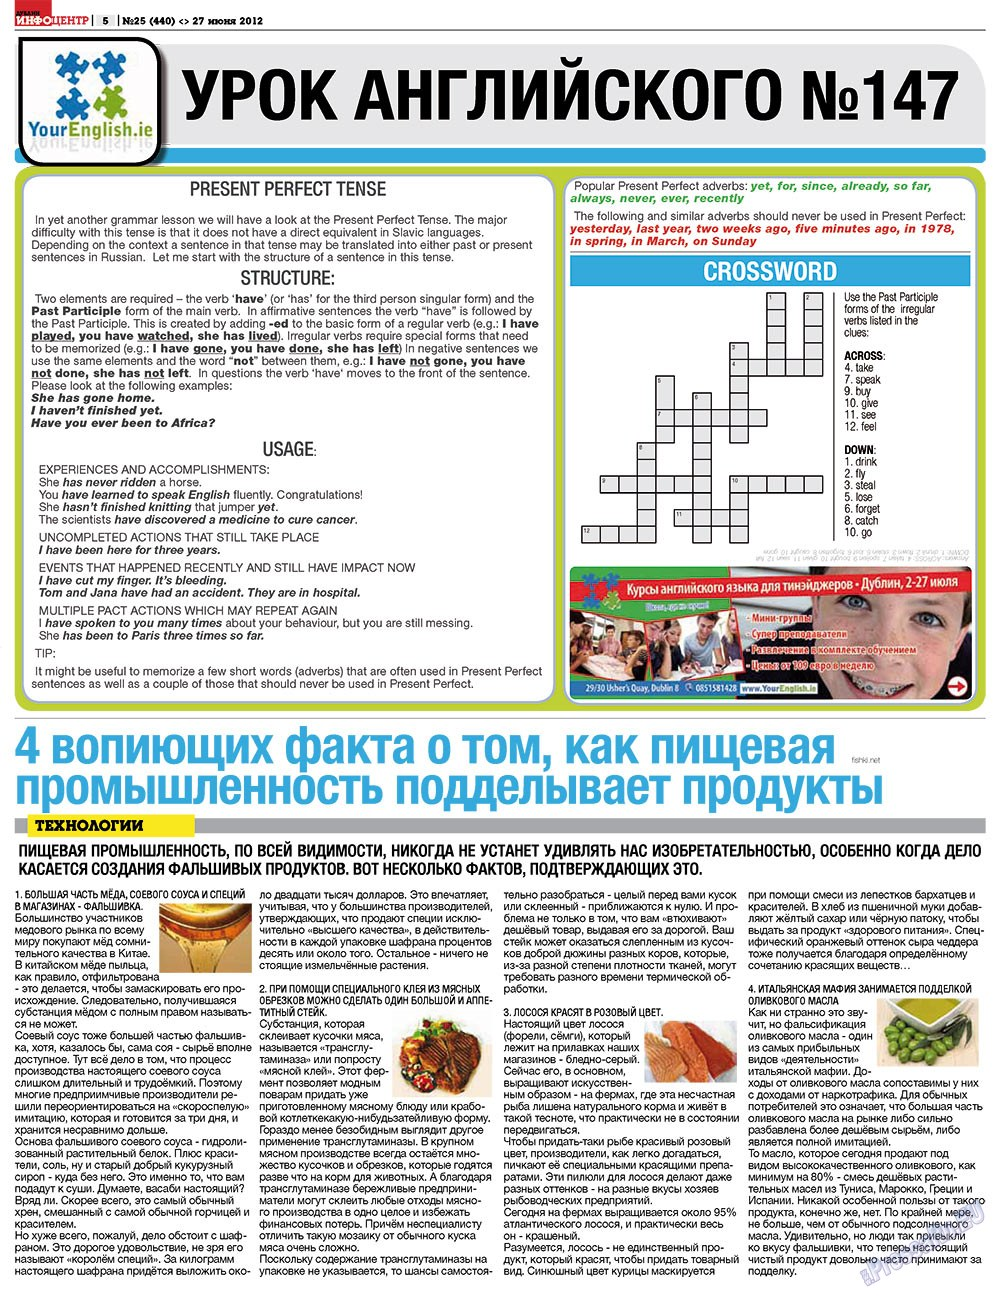 Дублин инфоцентр (газета). 2012 год, номер 25, стр. 5